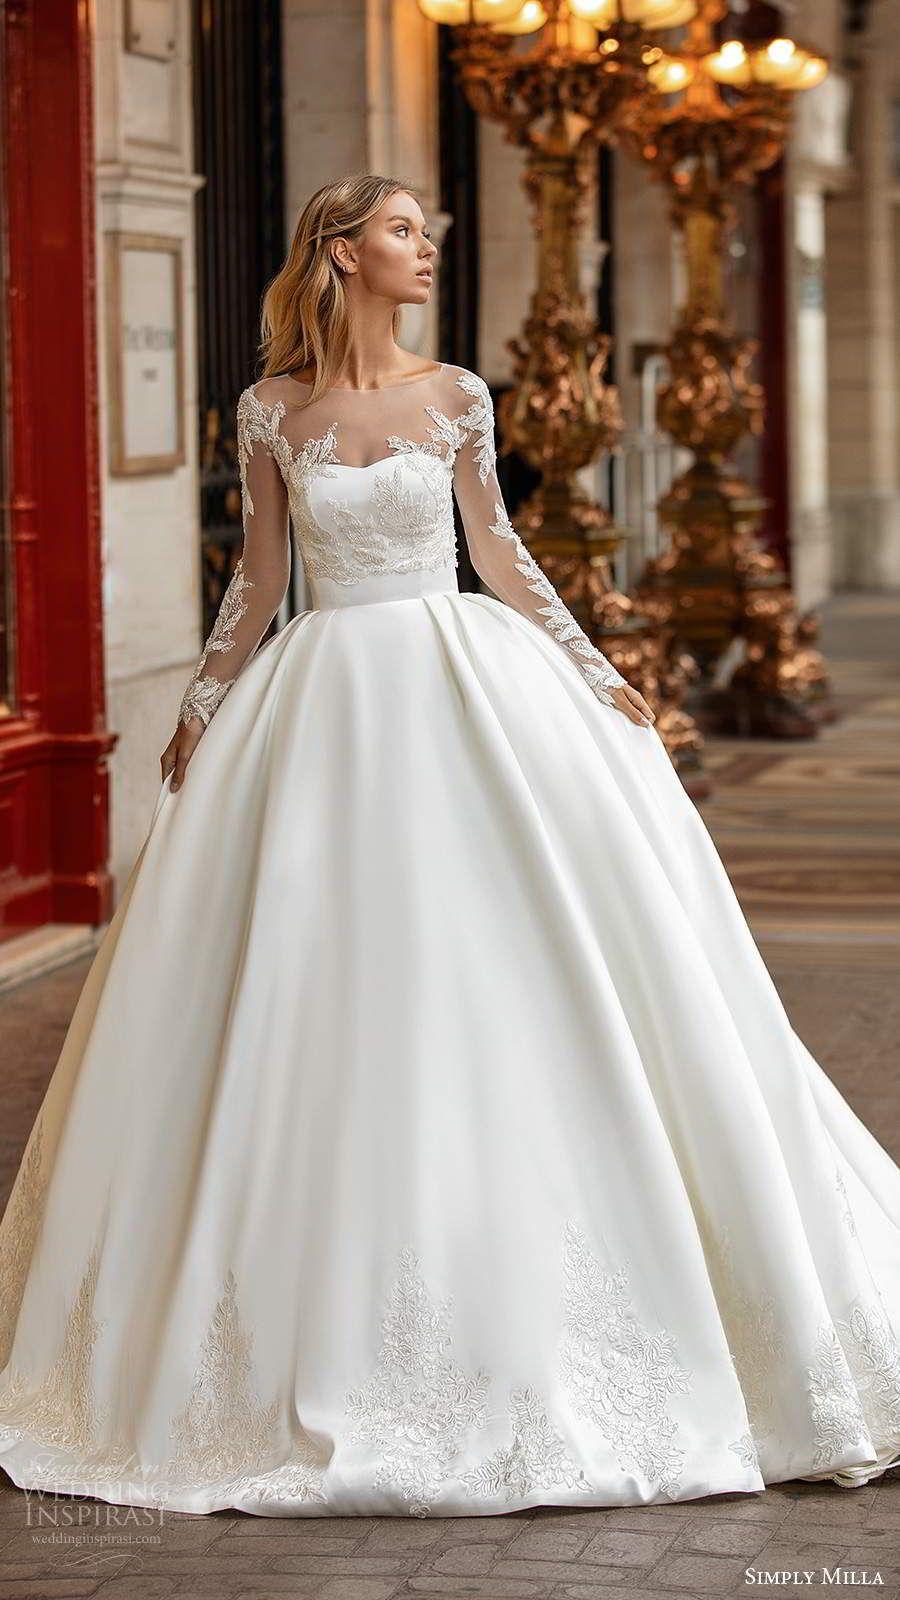 Milla Nova S Simply Milla 2020 Wedding Dresses Wedding Inspirasi Ball Gowns Wedding Wedding Dress Long Sleeve Simple Wedding Gowns [ 1600 x 900 Pixel ]